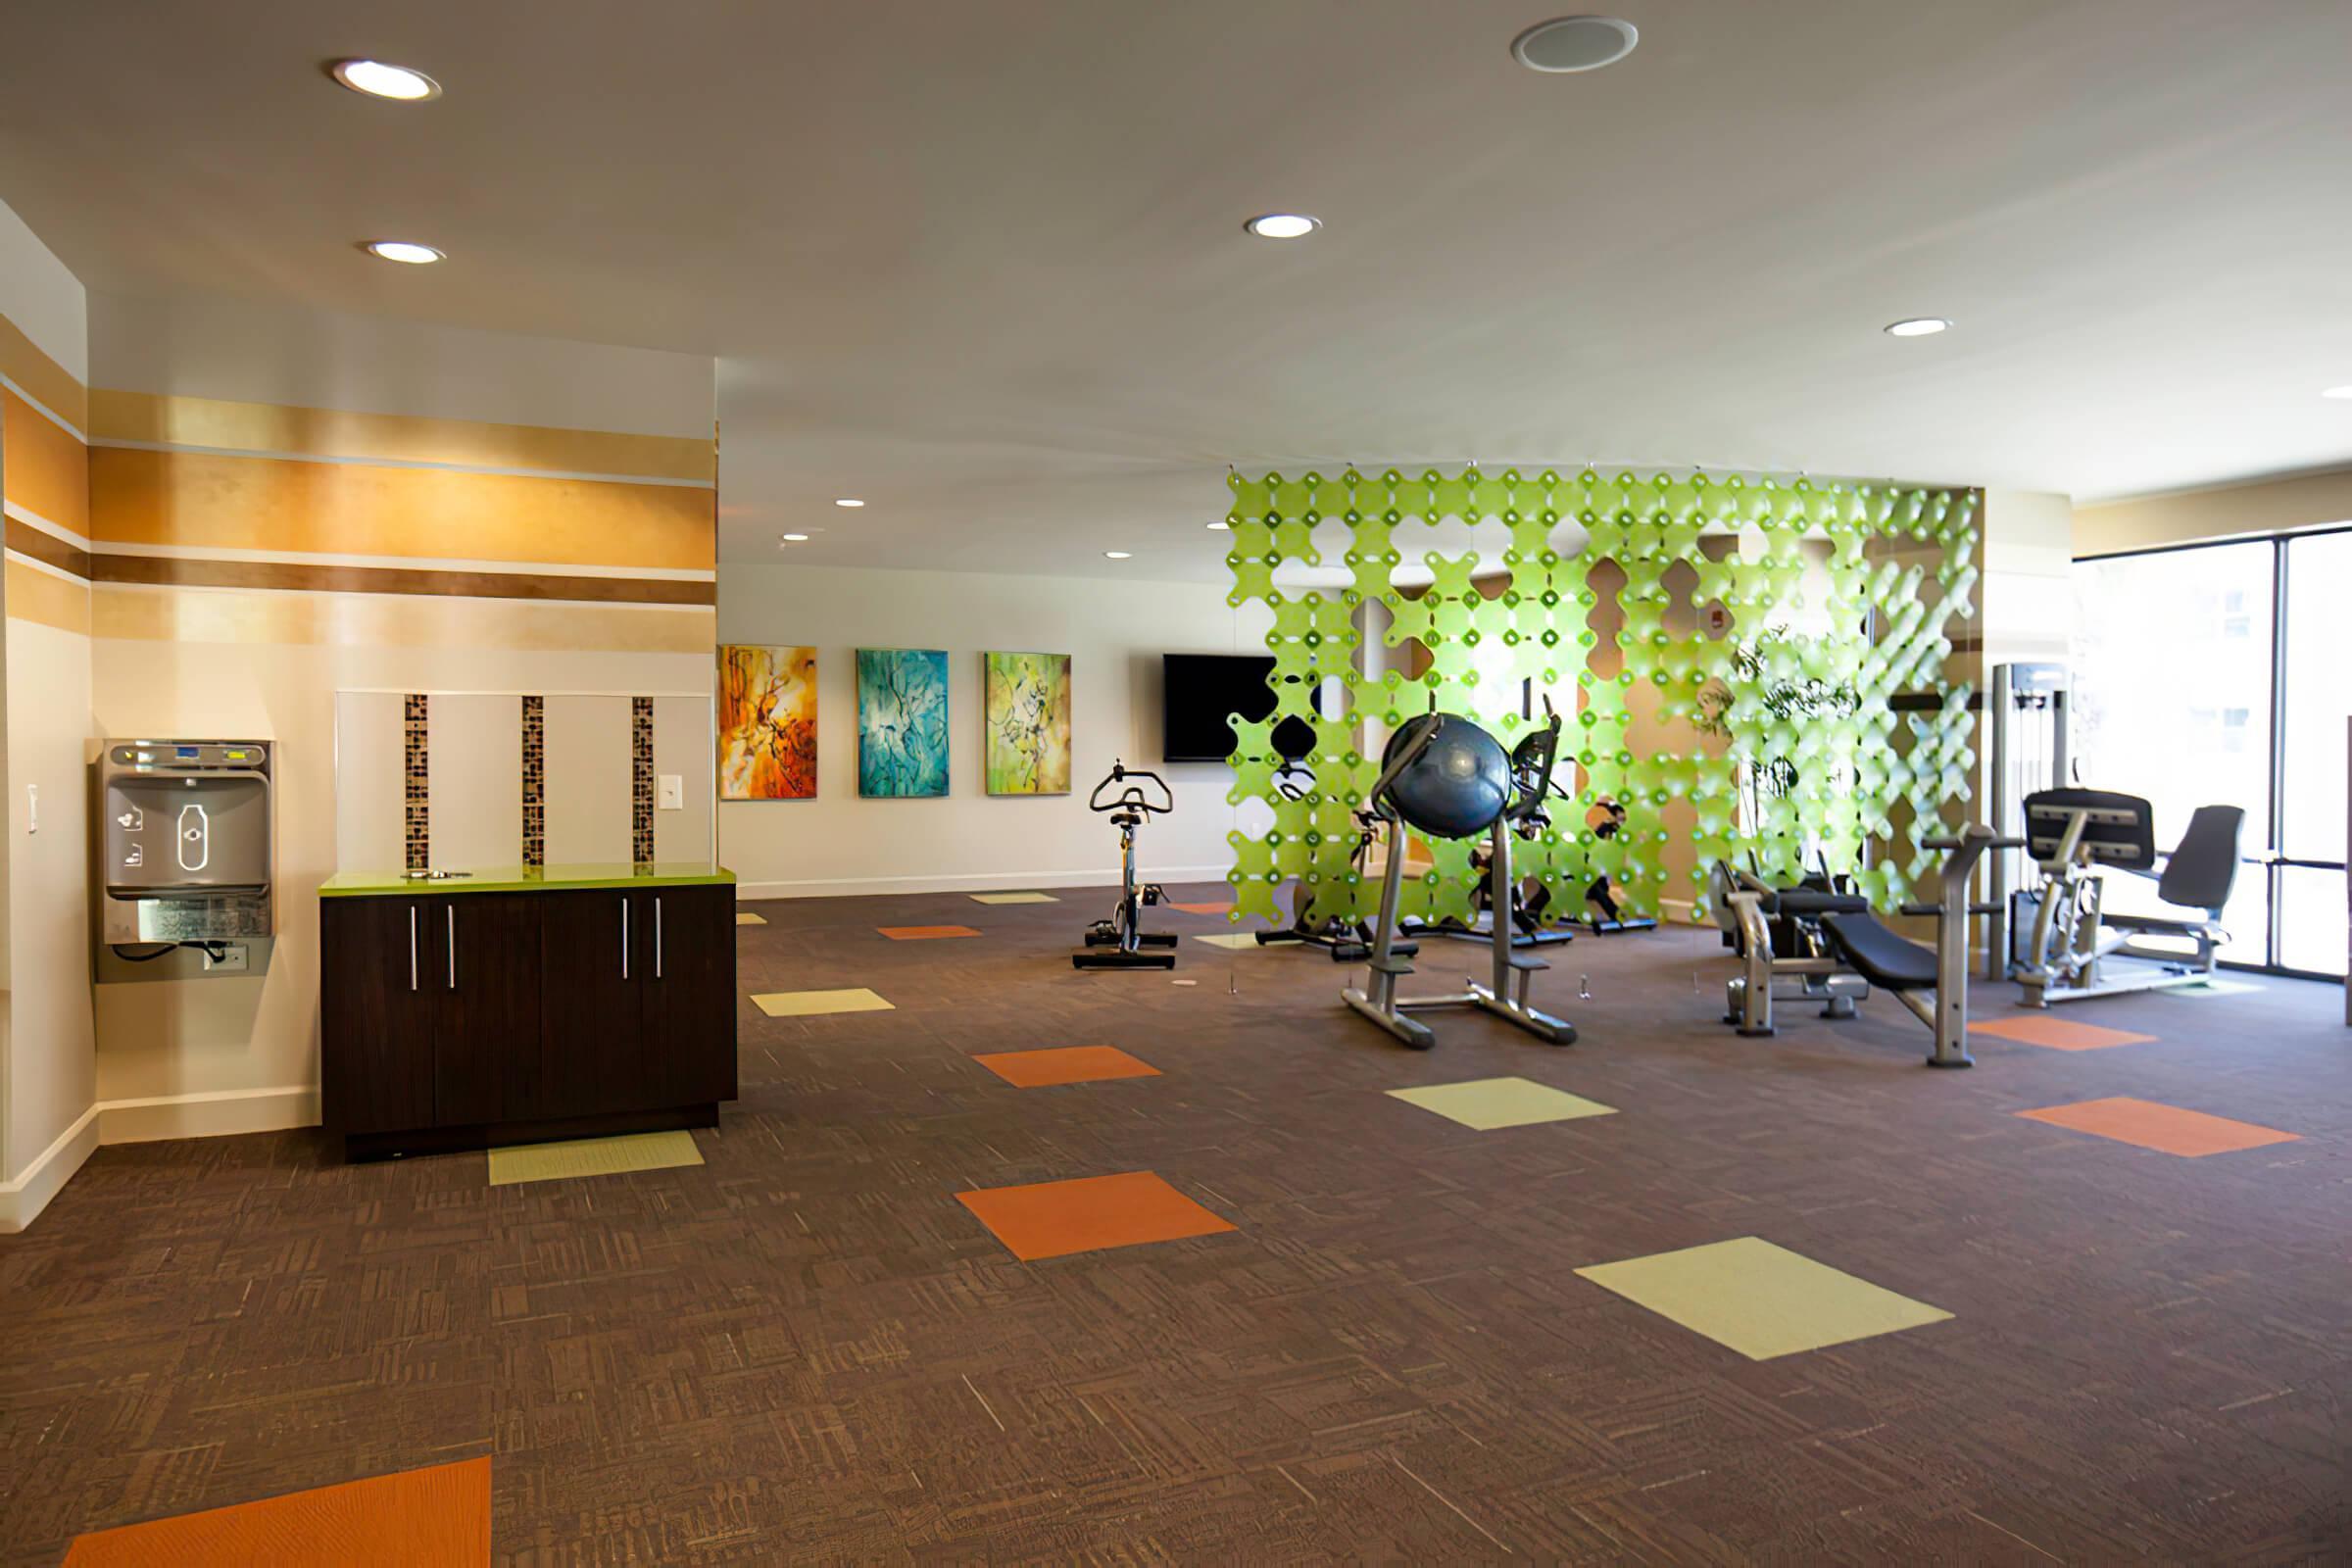 San Antigua Day 3 Fitness Center Angle 4-width-2400px.jpg